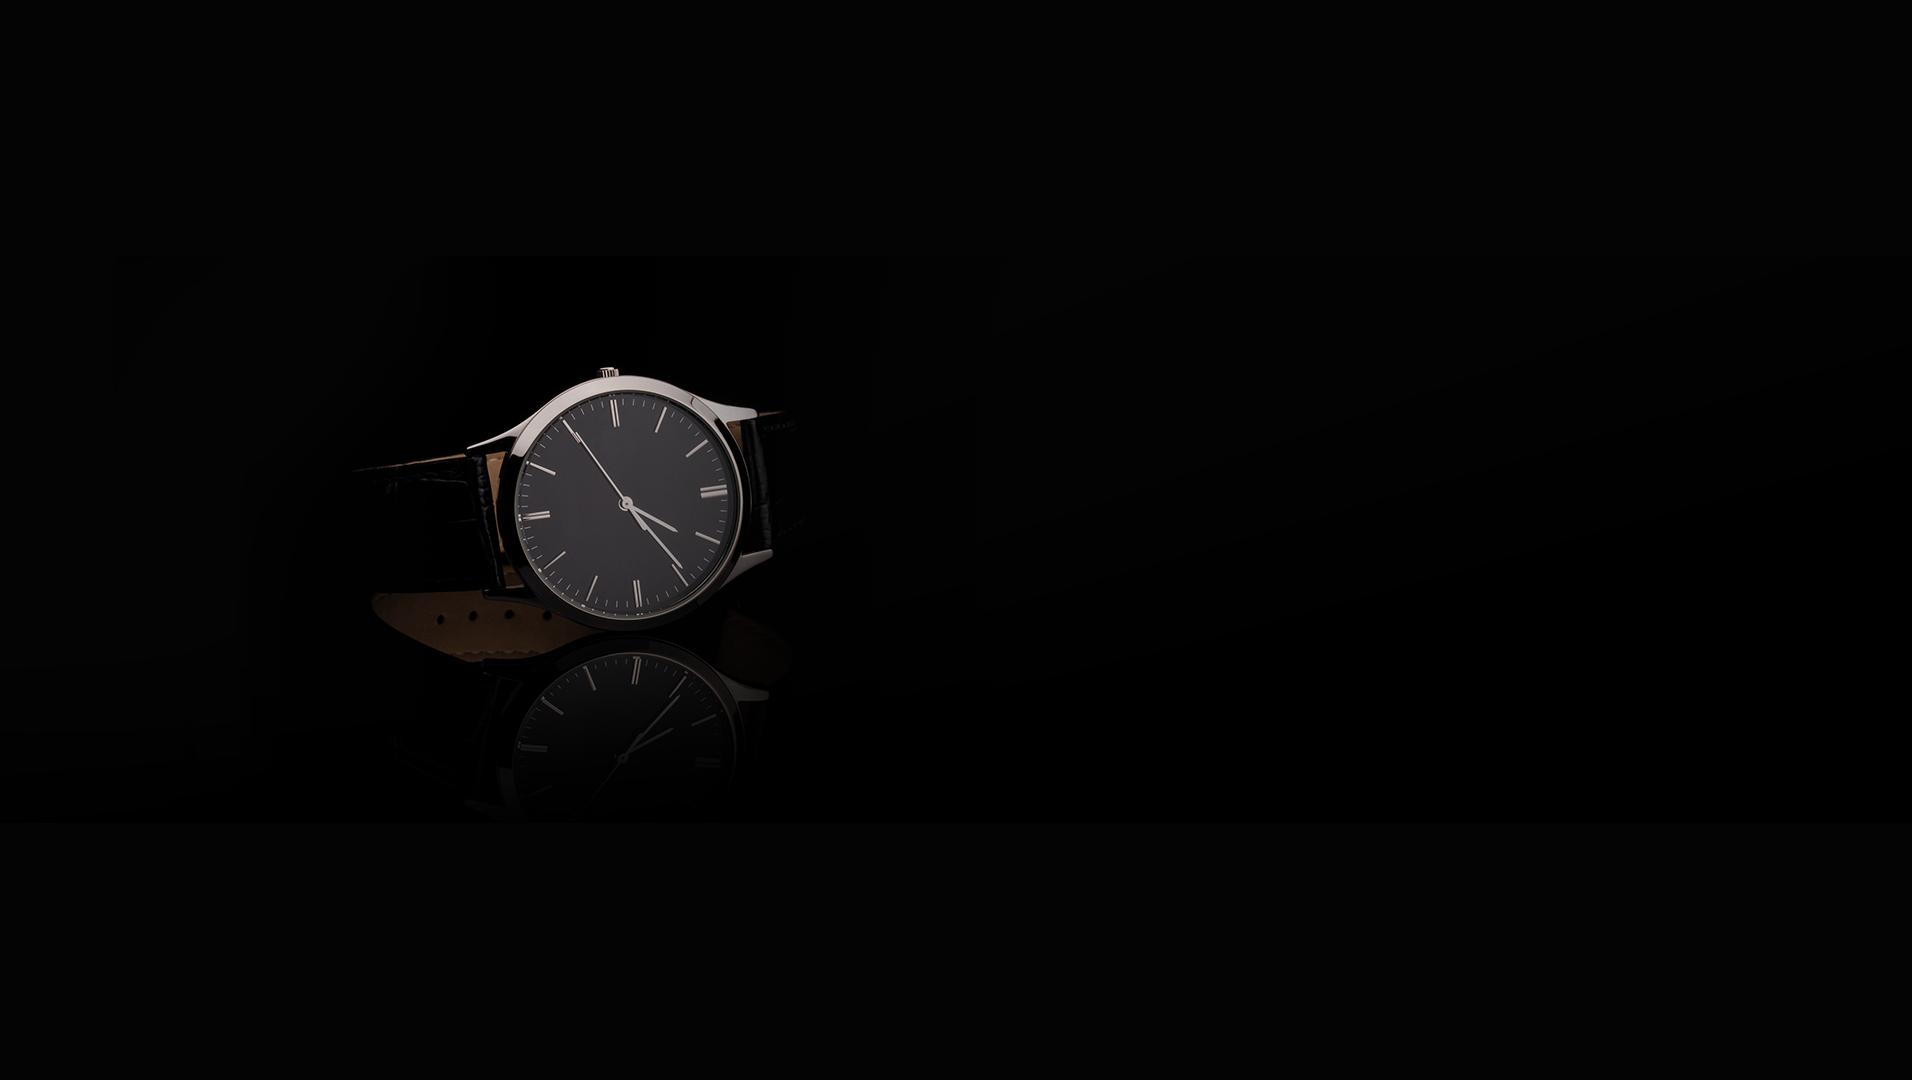 Orologio nero